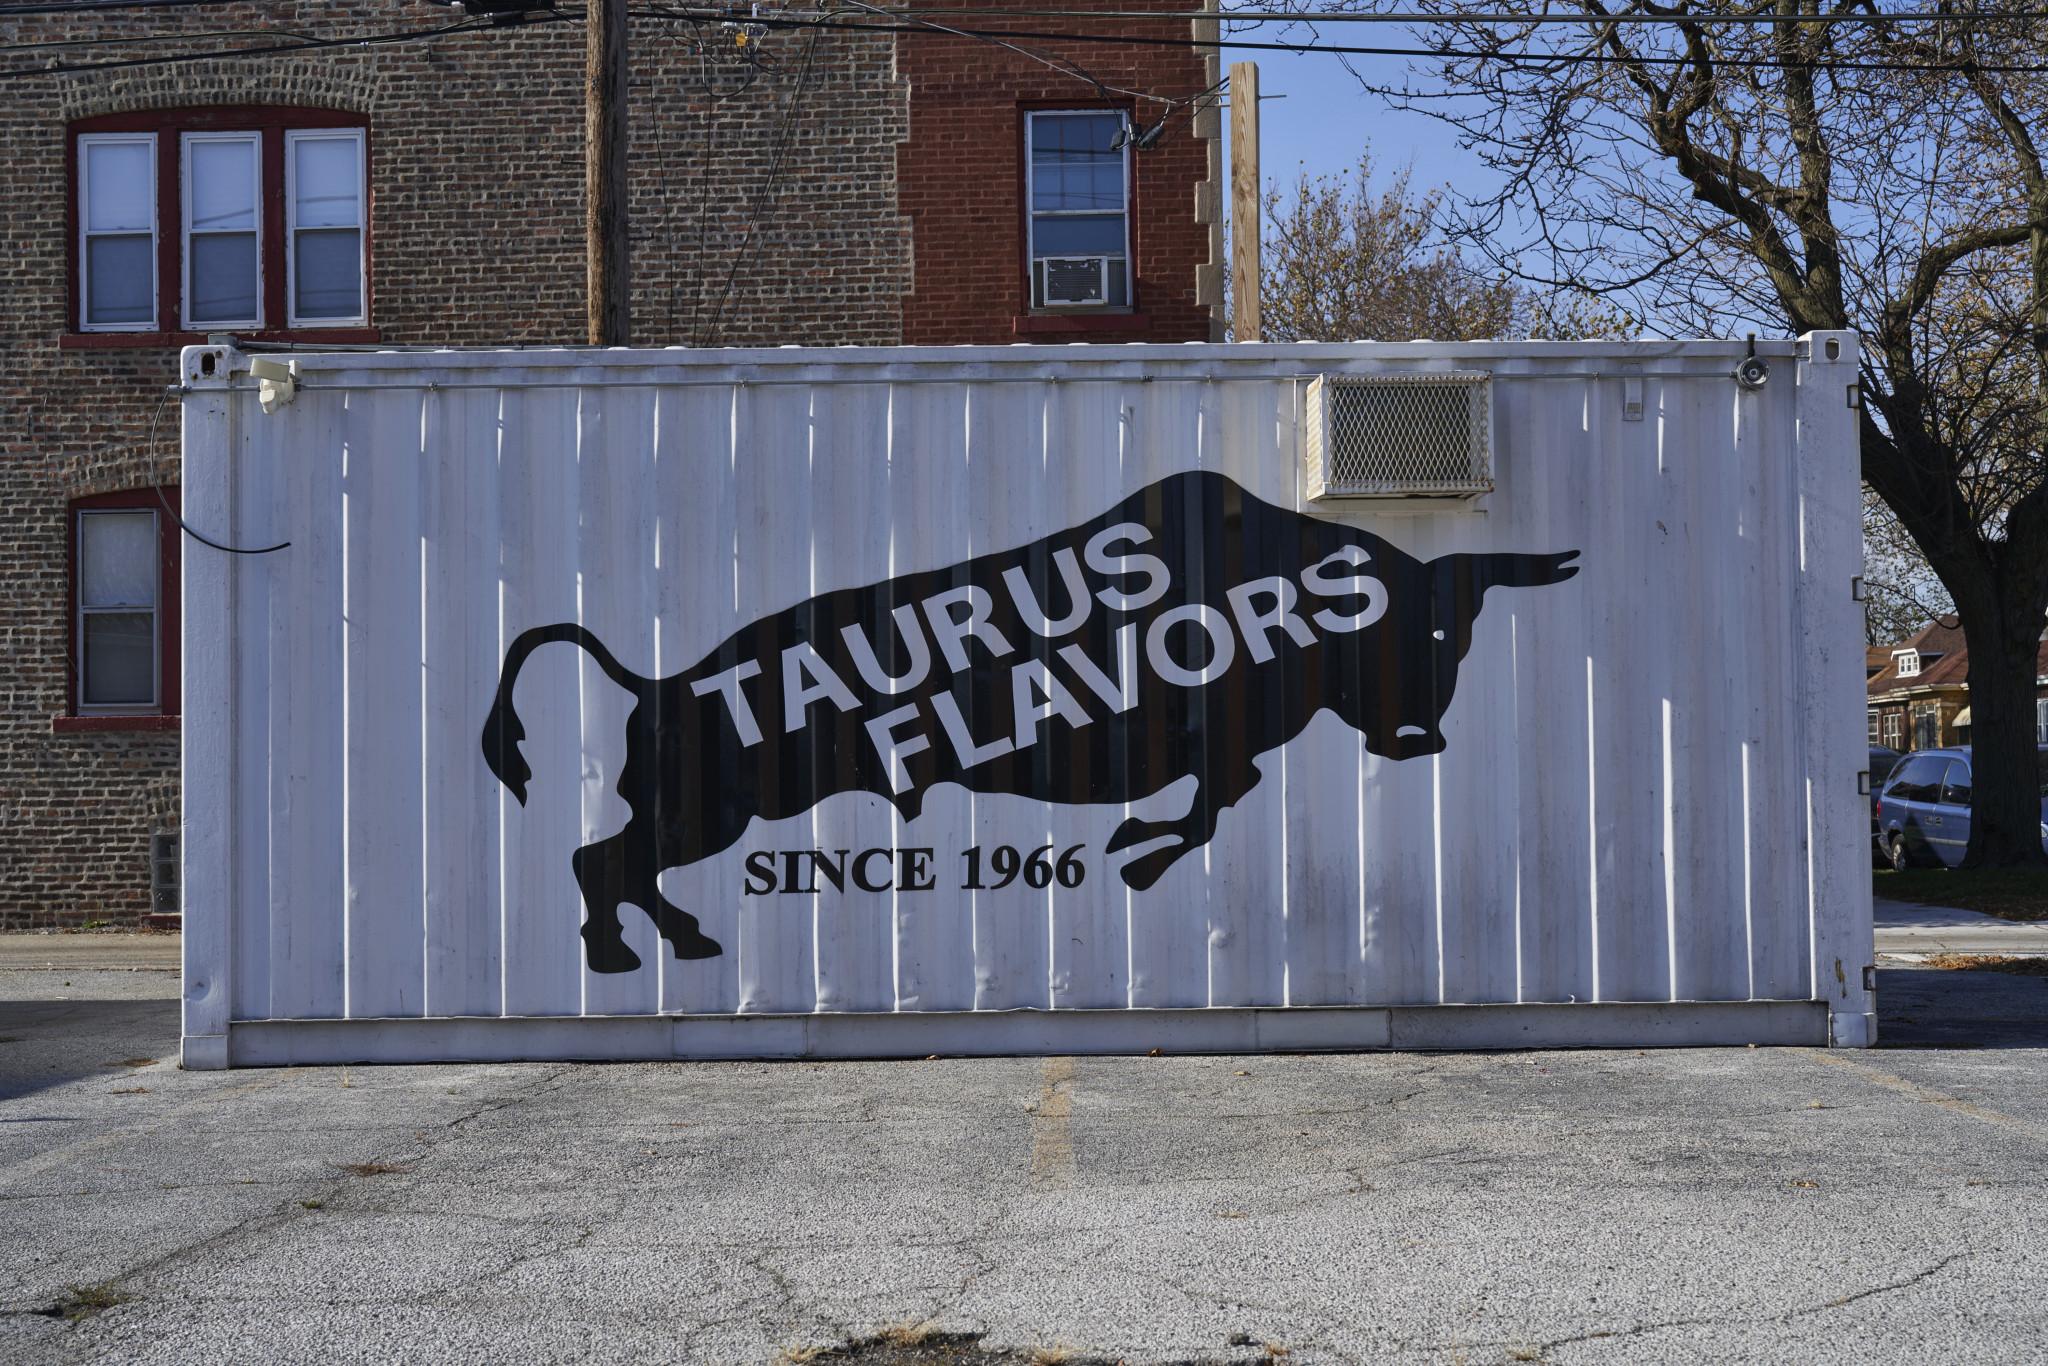 Taurus Flavors. Photo Credit: Sarah Derer